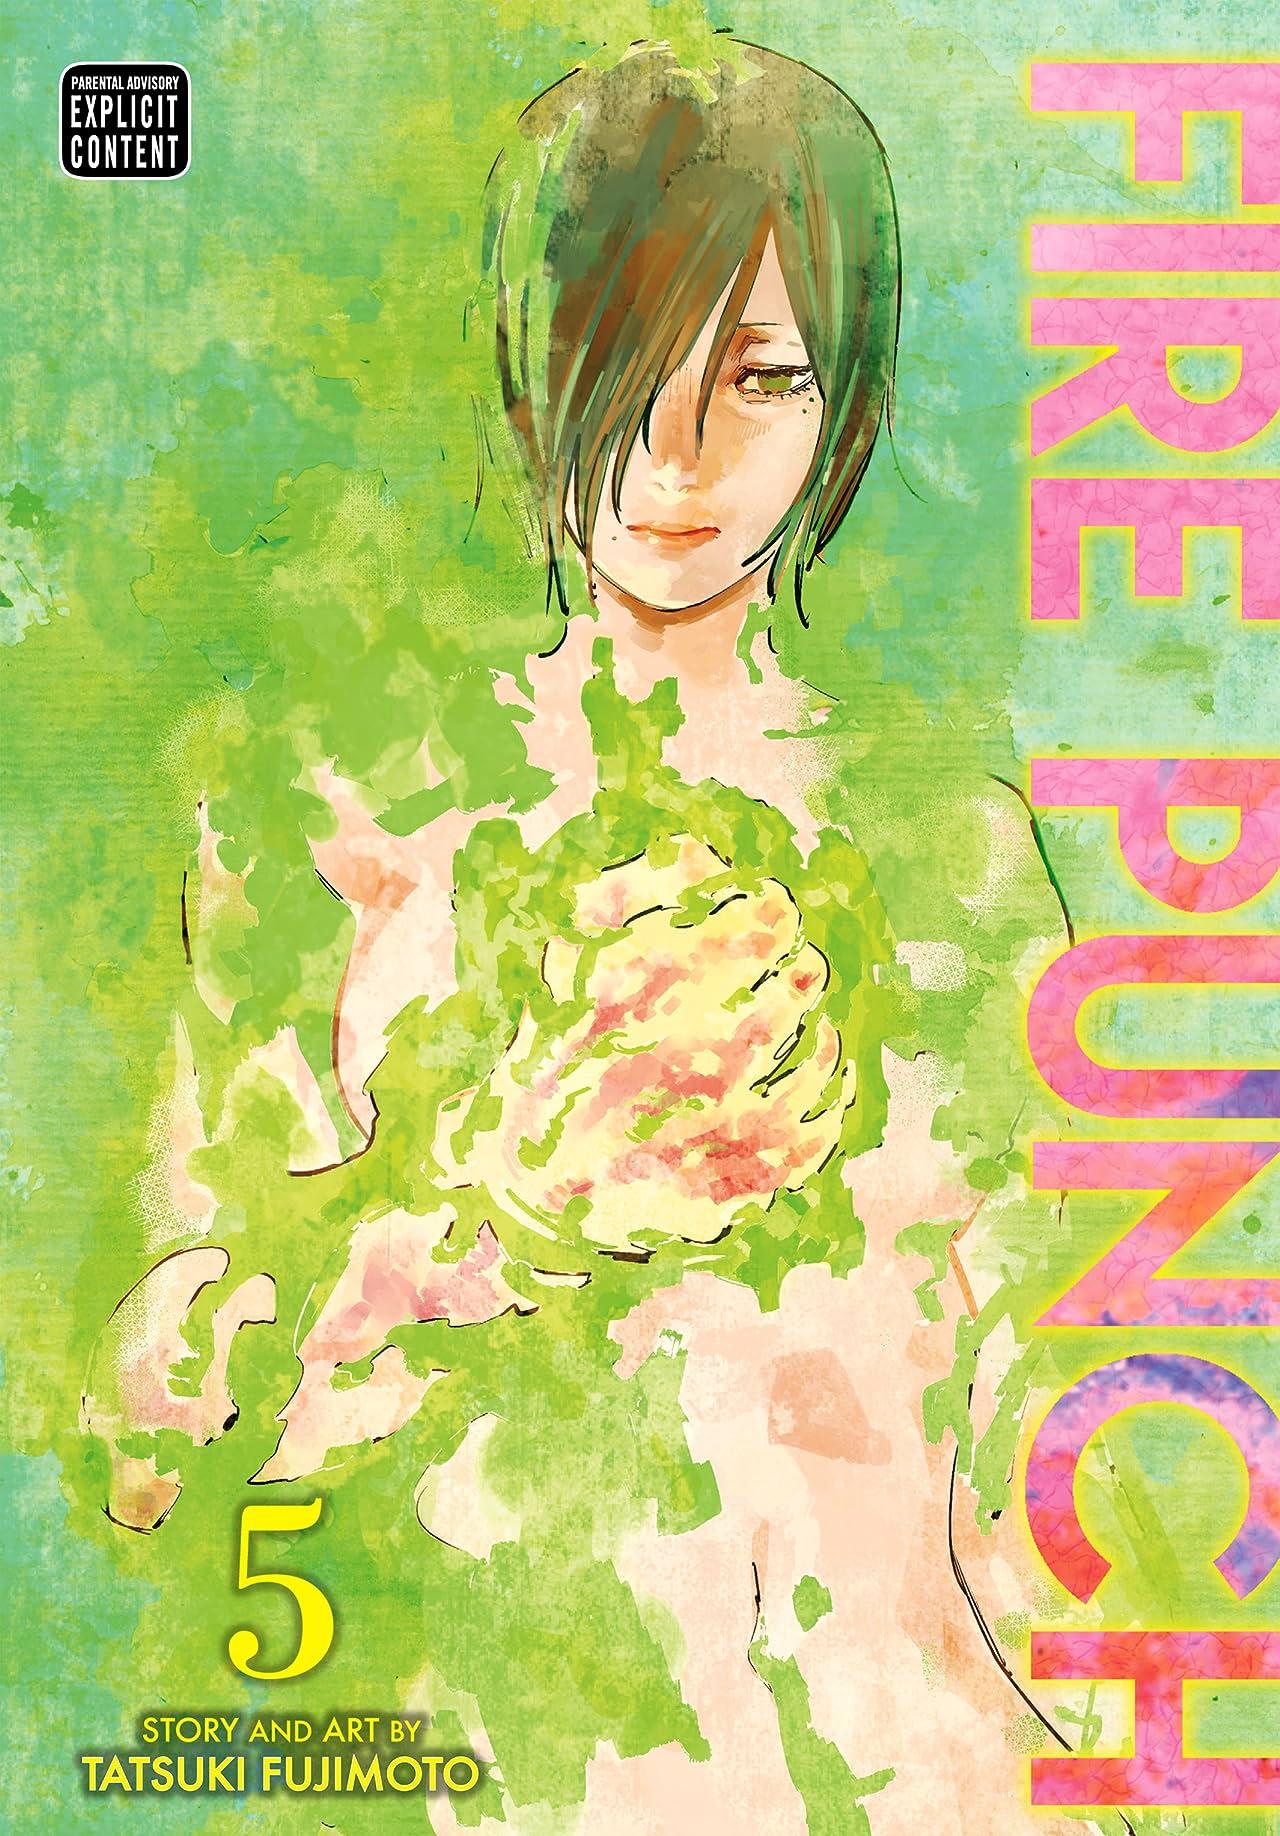 Fire Punch Vol. 5